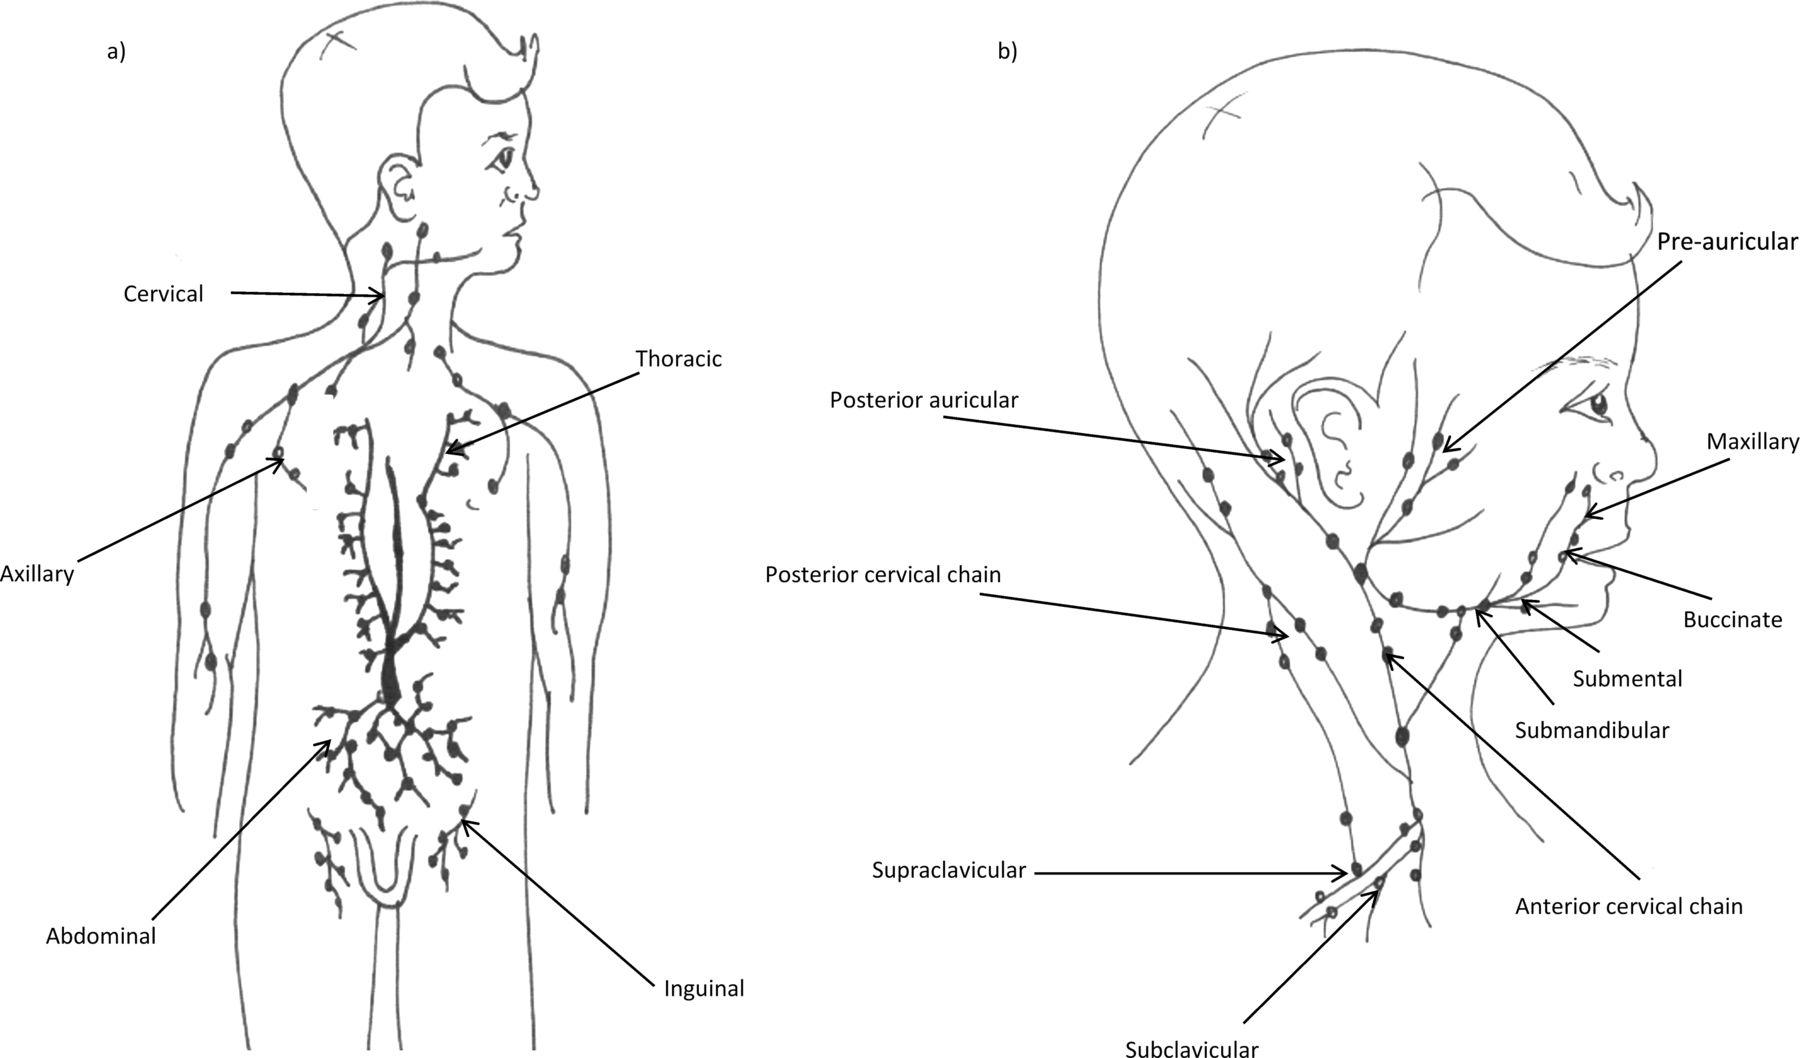 Lymphadenopathy In Children Refer Or Reassure King Et